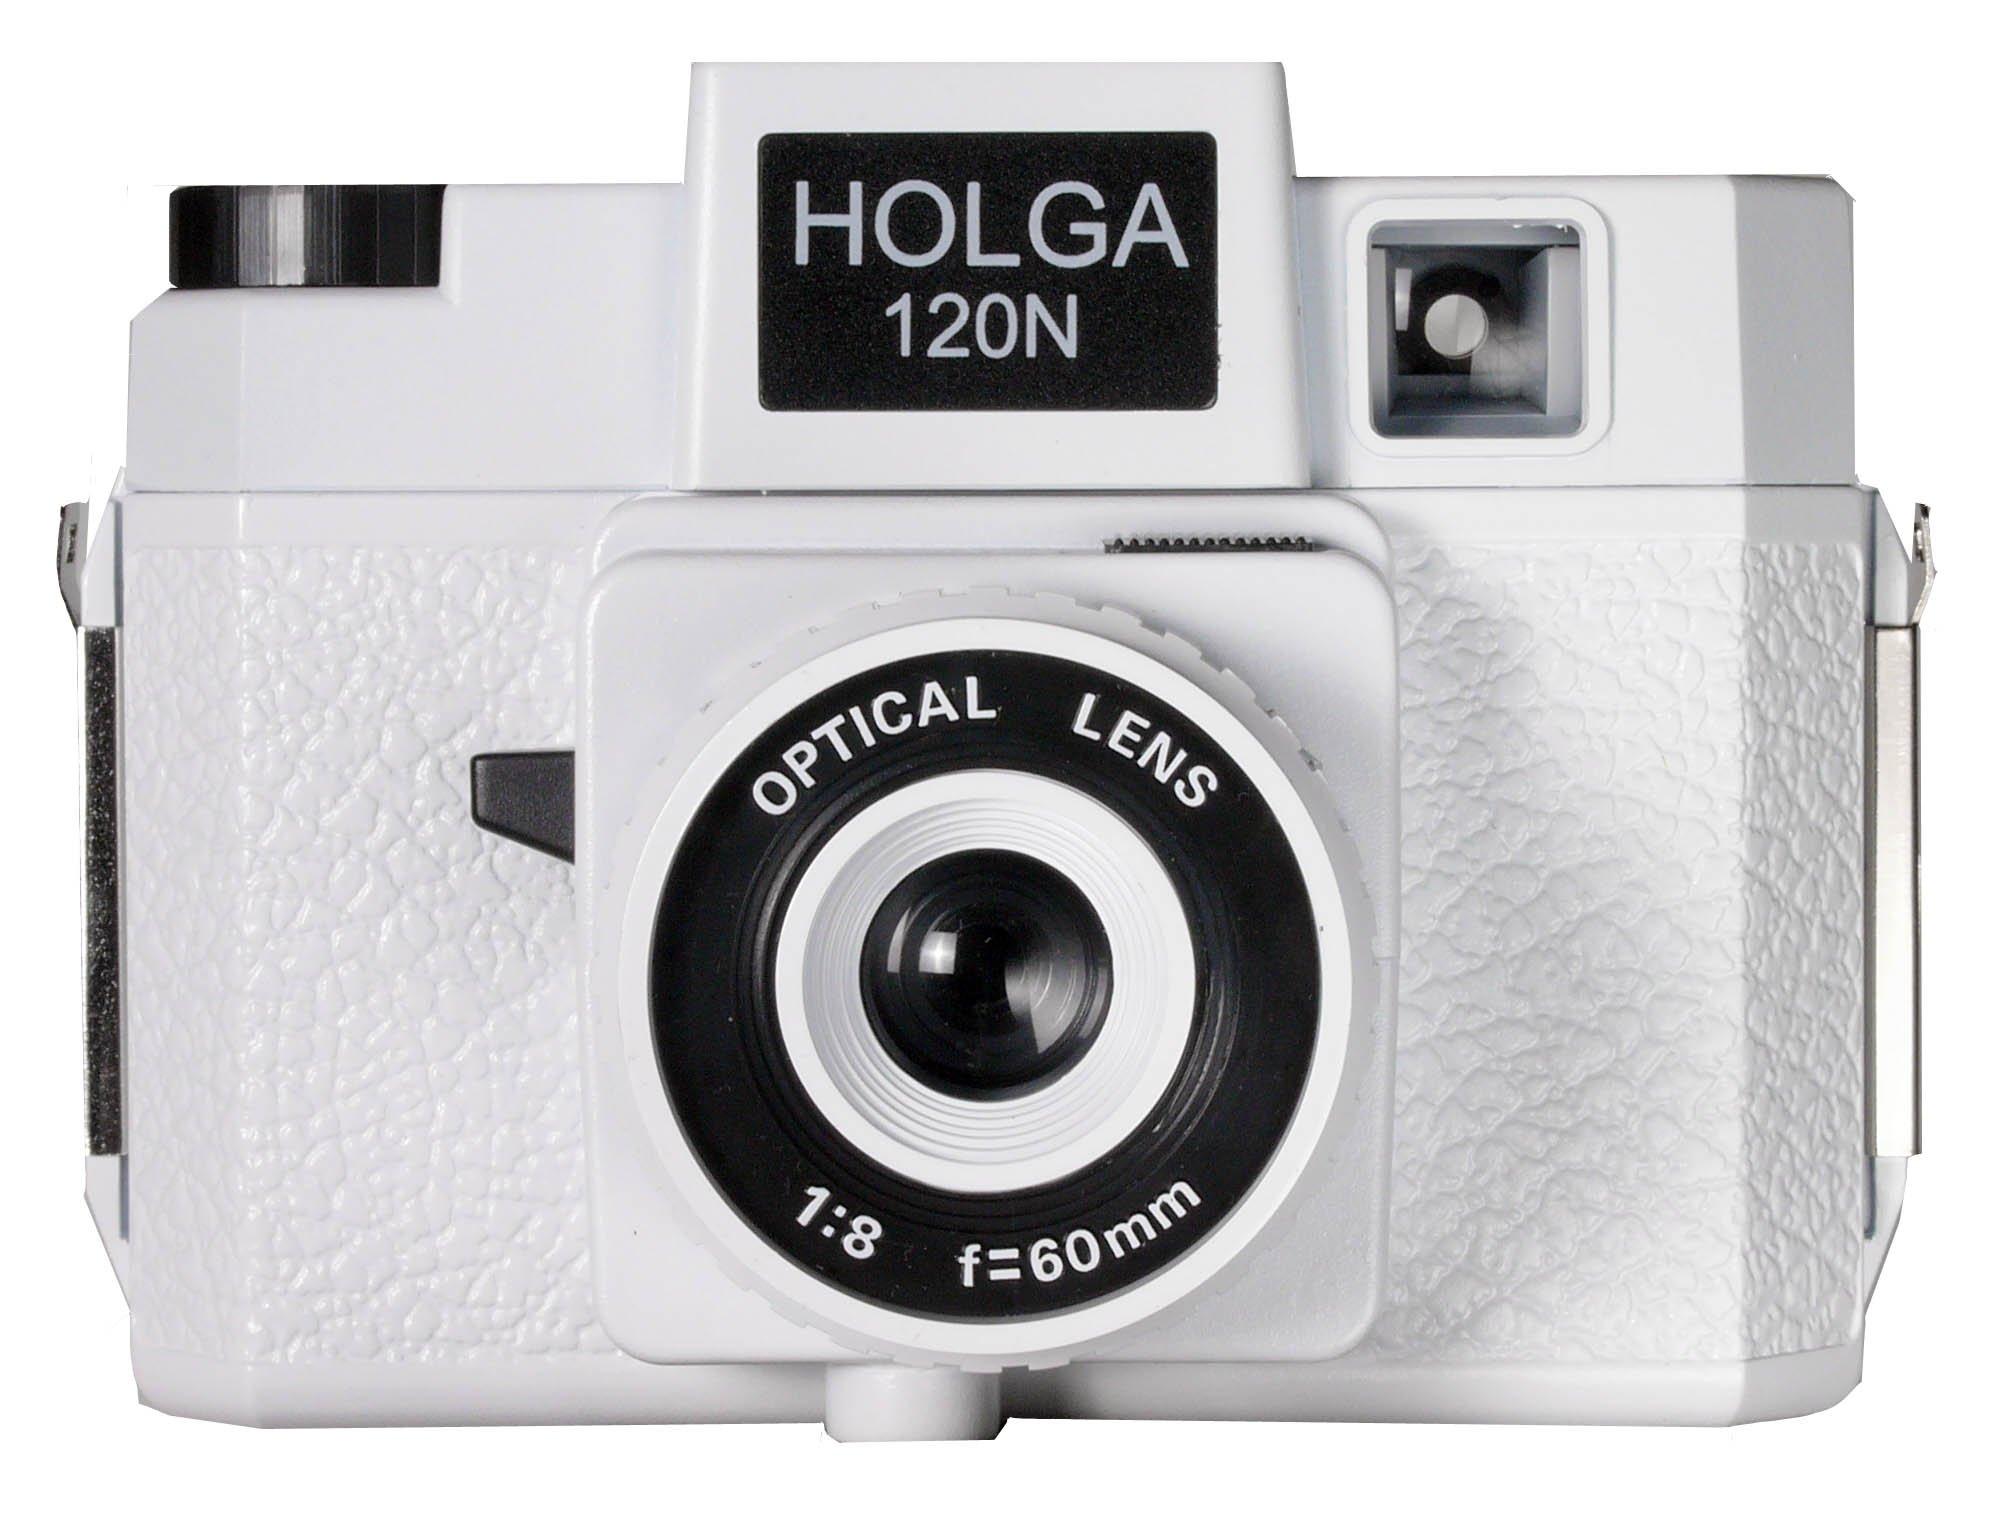 Holga 785120 120N Plastic Medium Format Camera - White (Black) by Holga